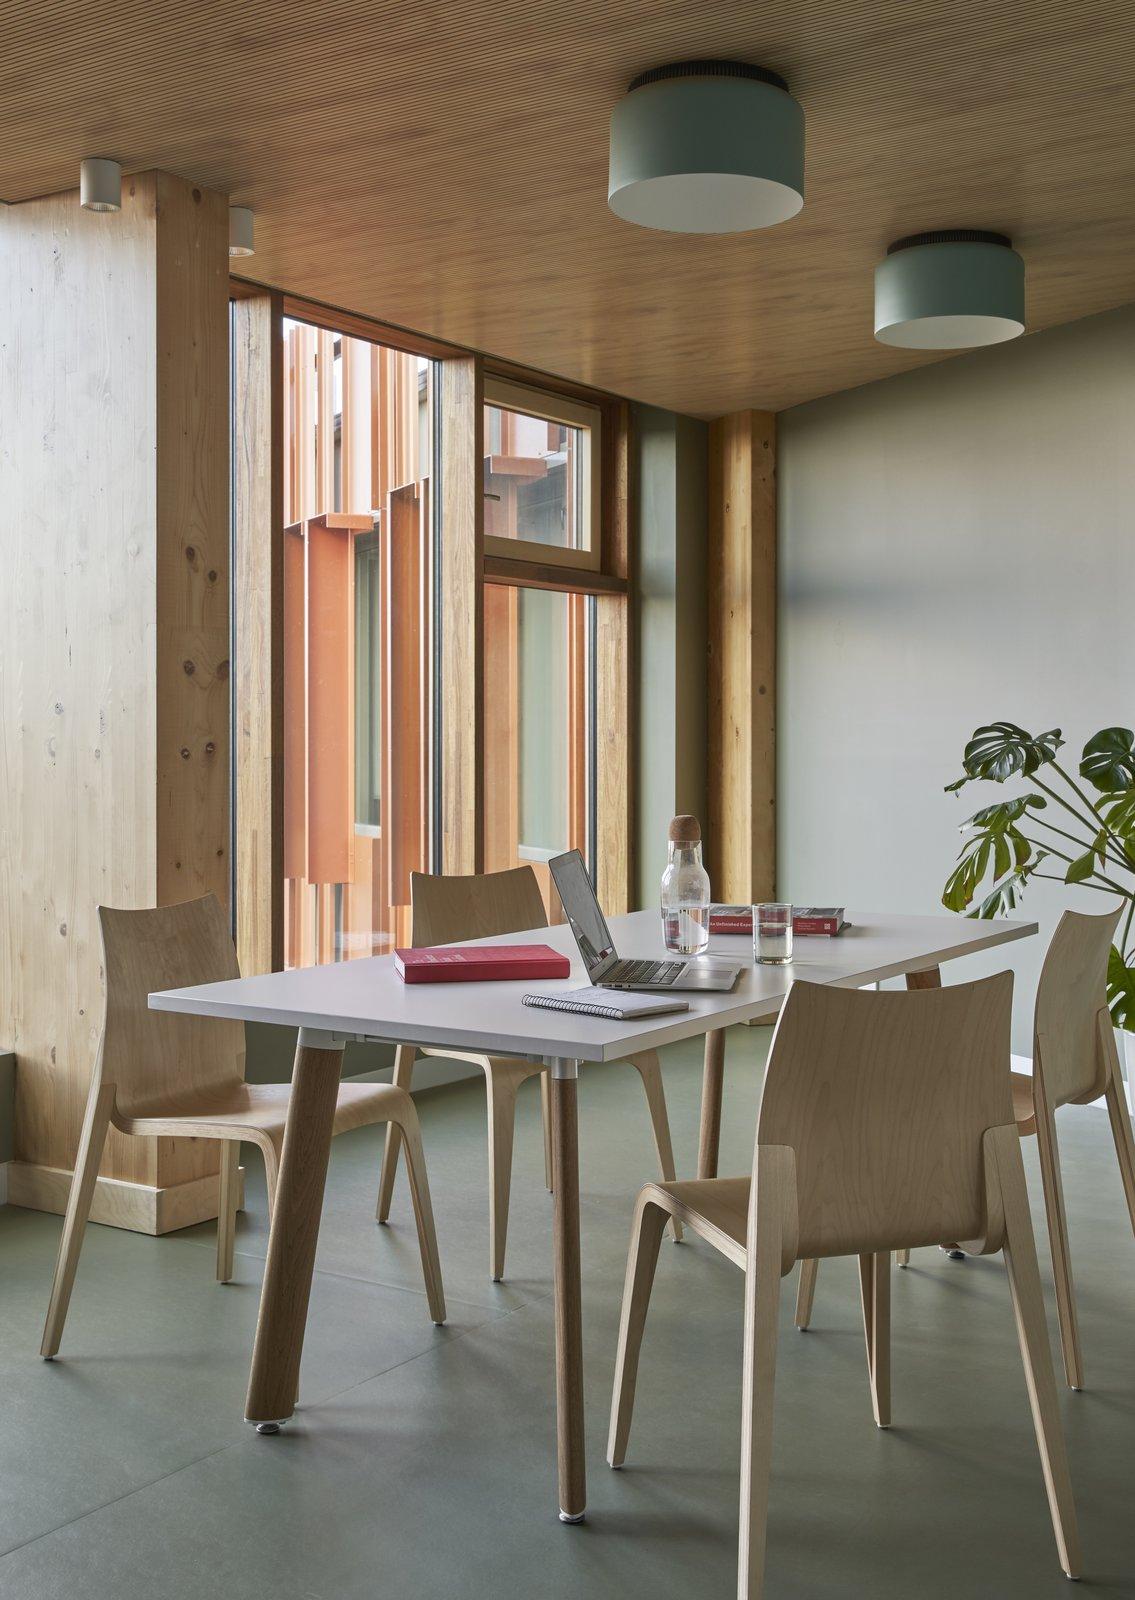 Gillies Hall at Monash University by JCB Architects study area